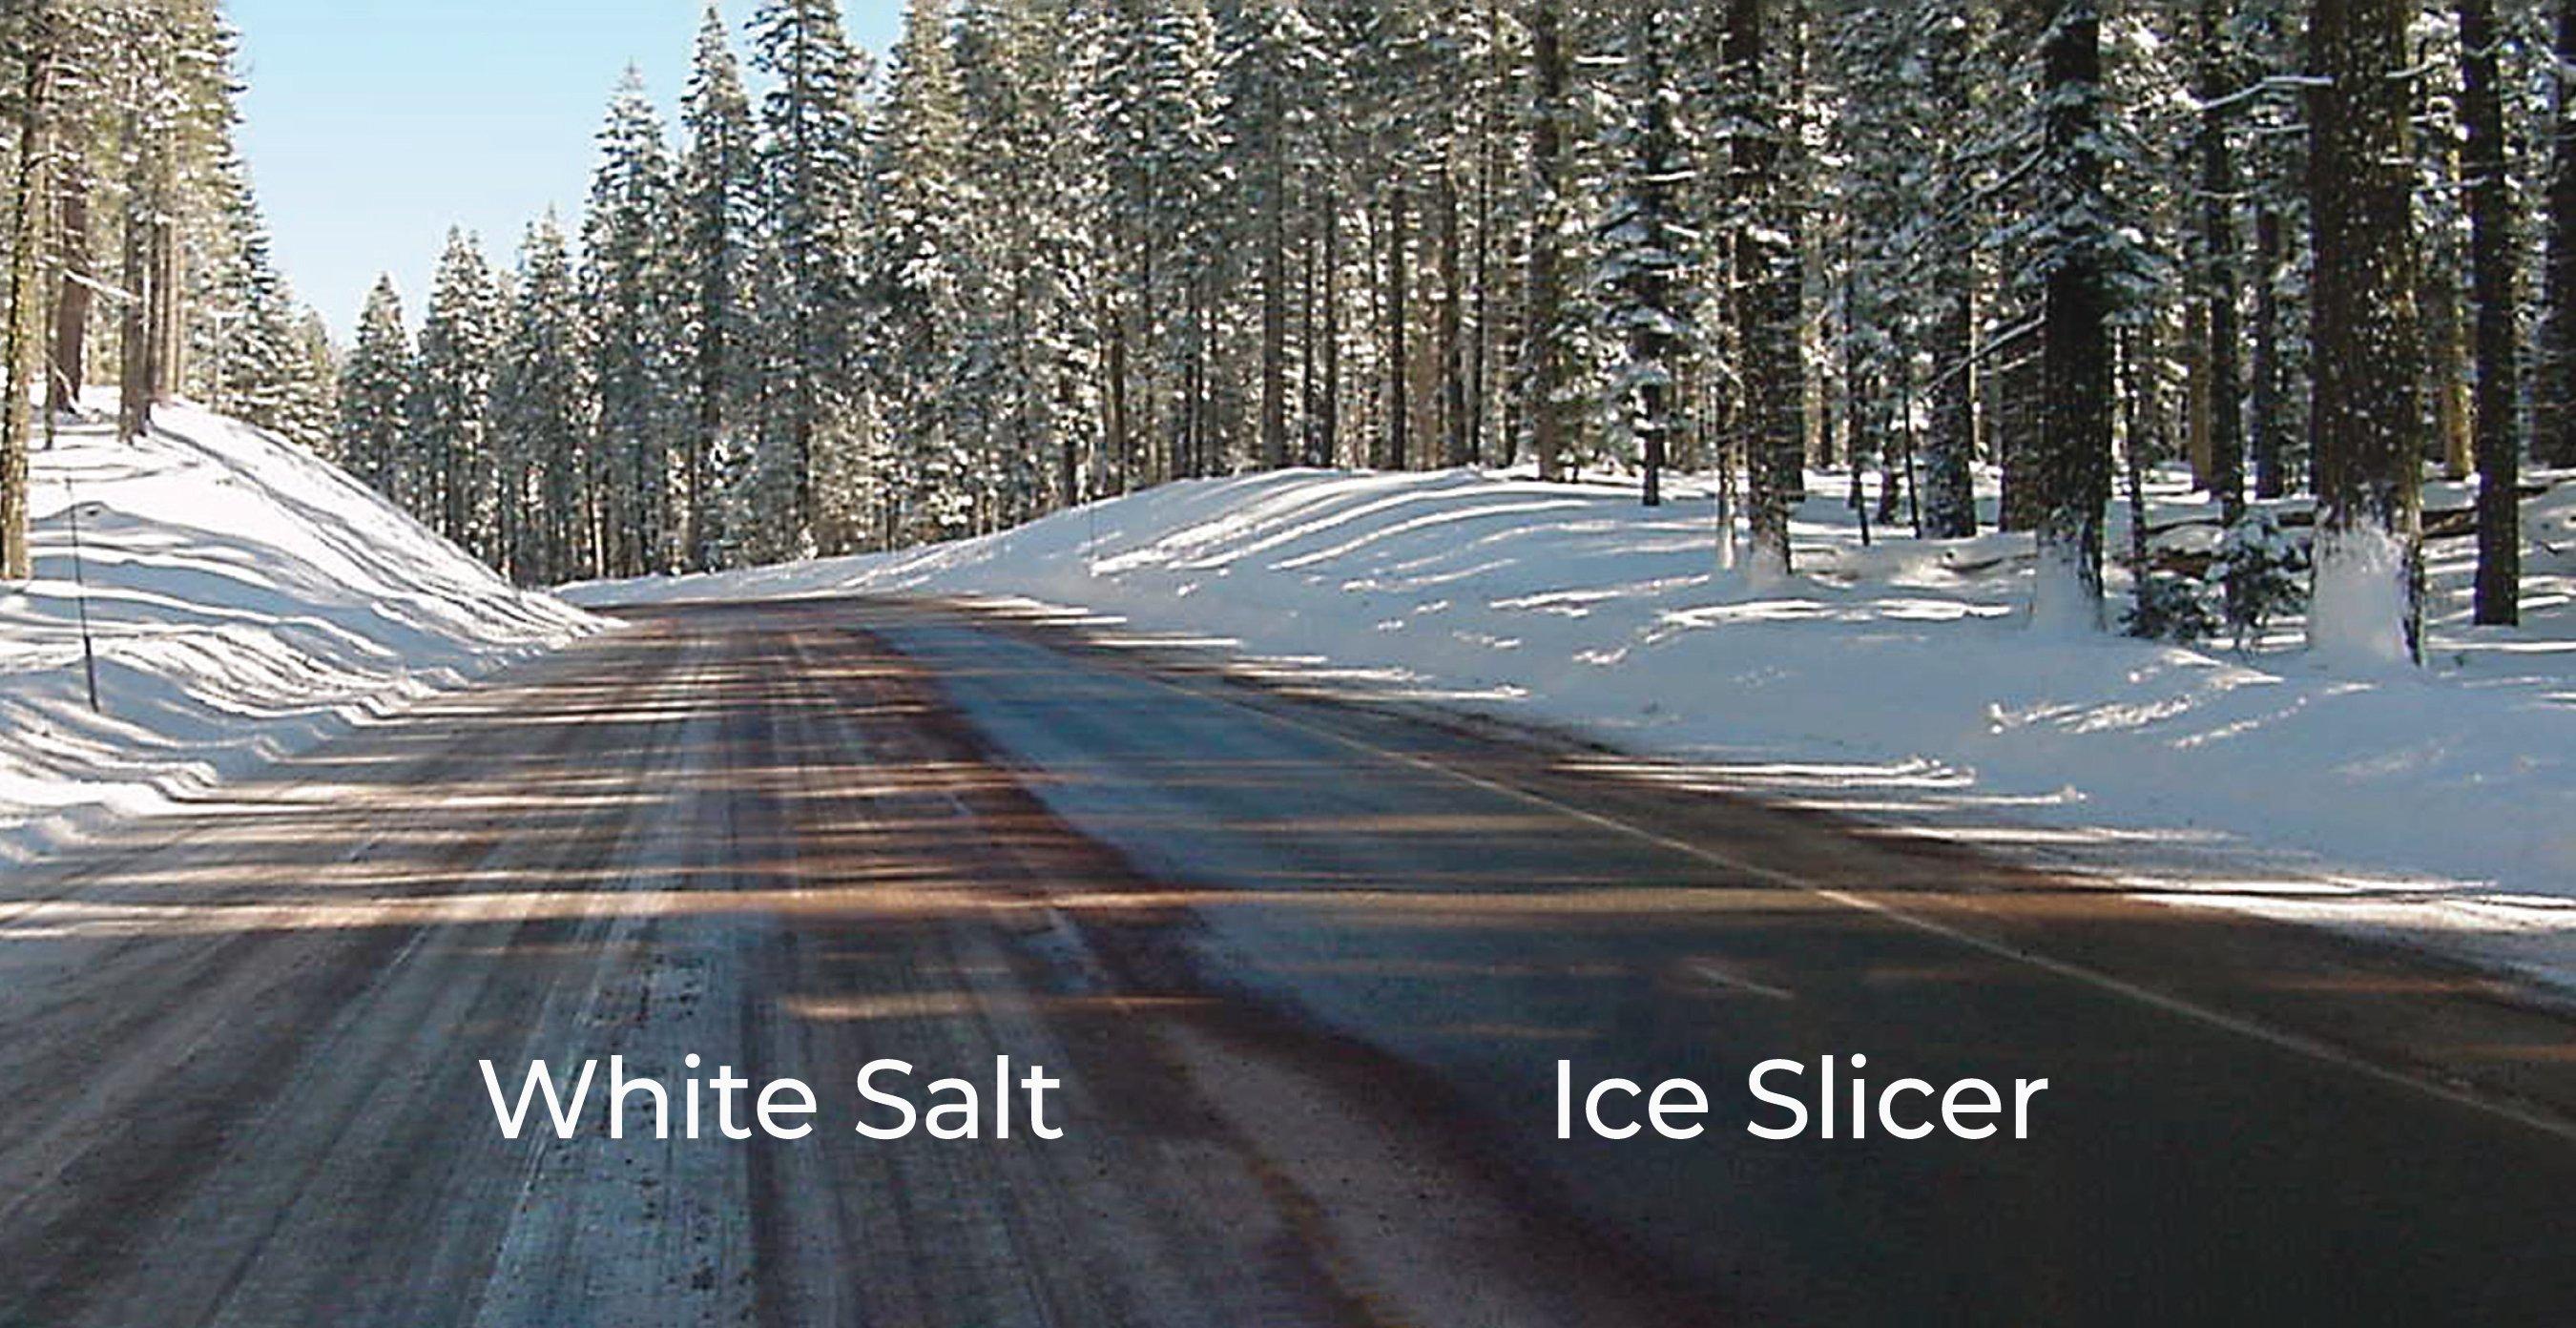 IceSlicer WhiteSalt compare